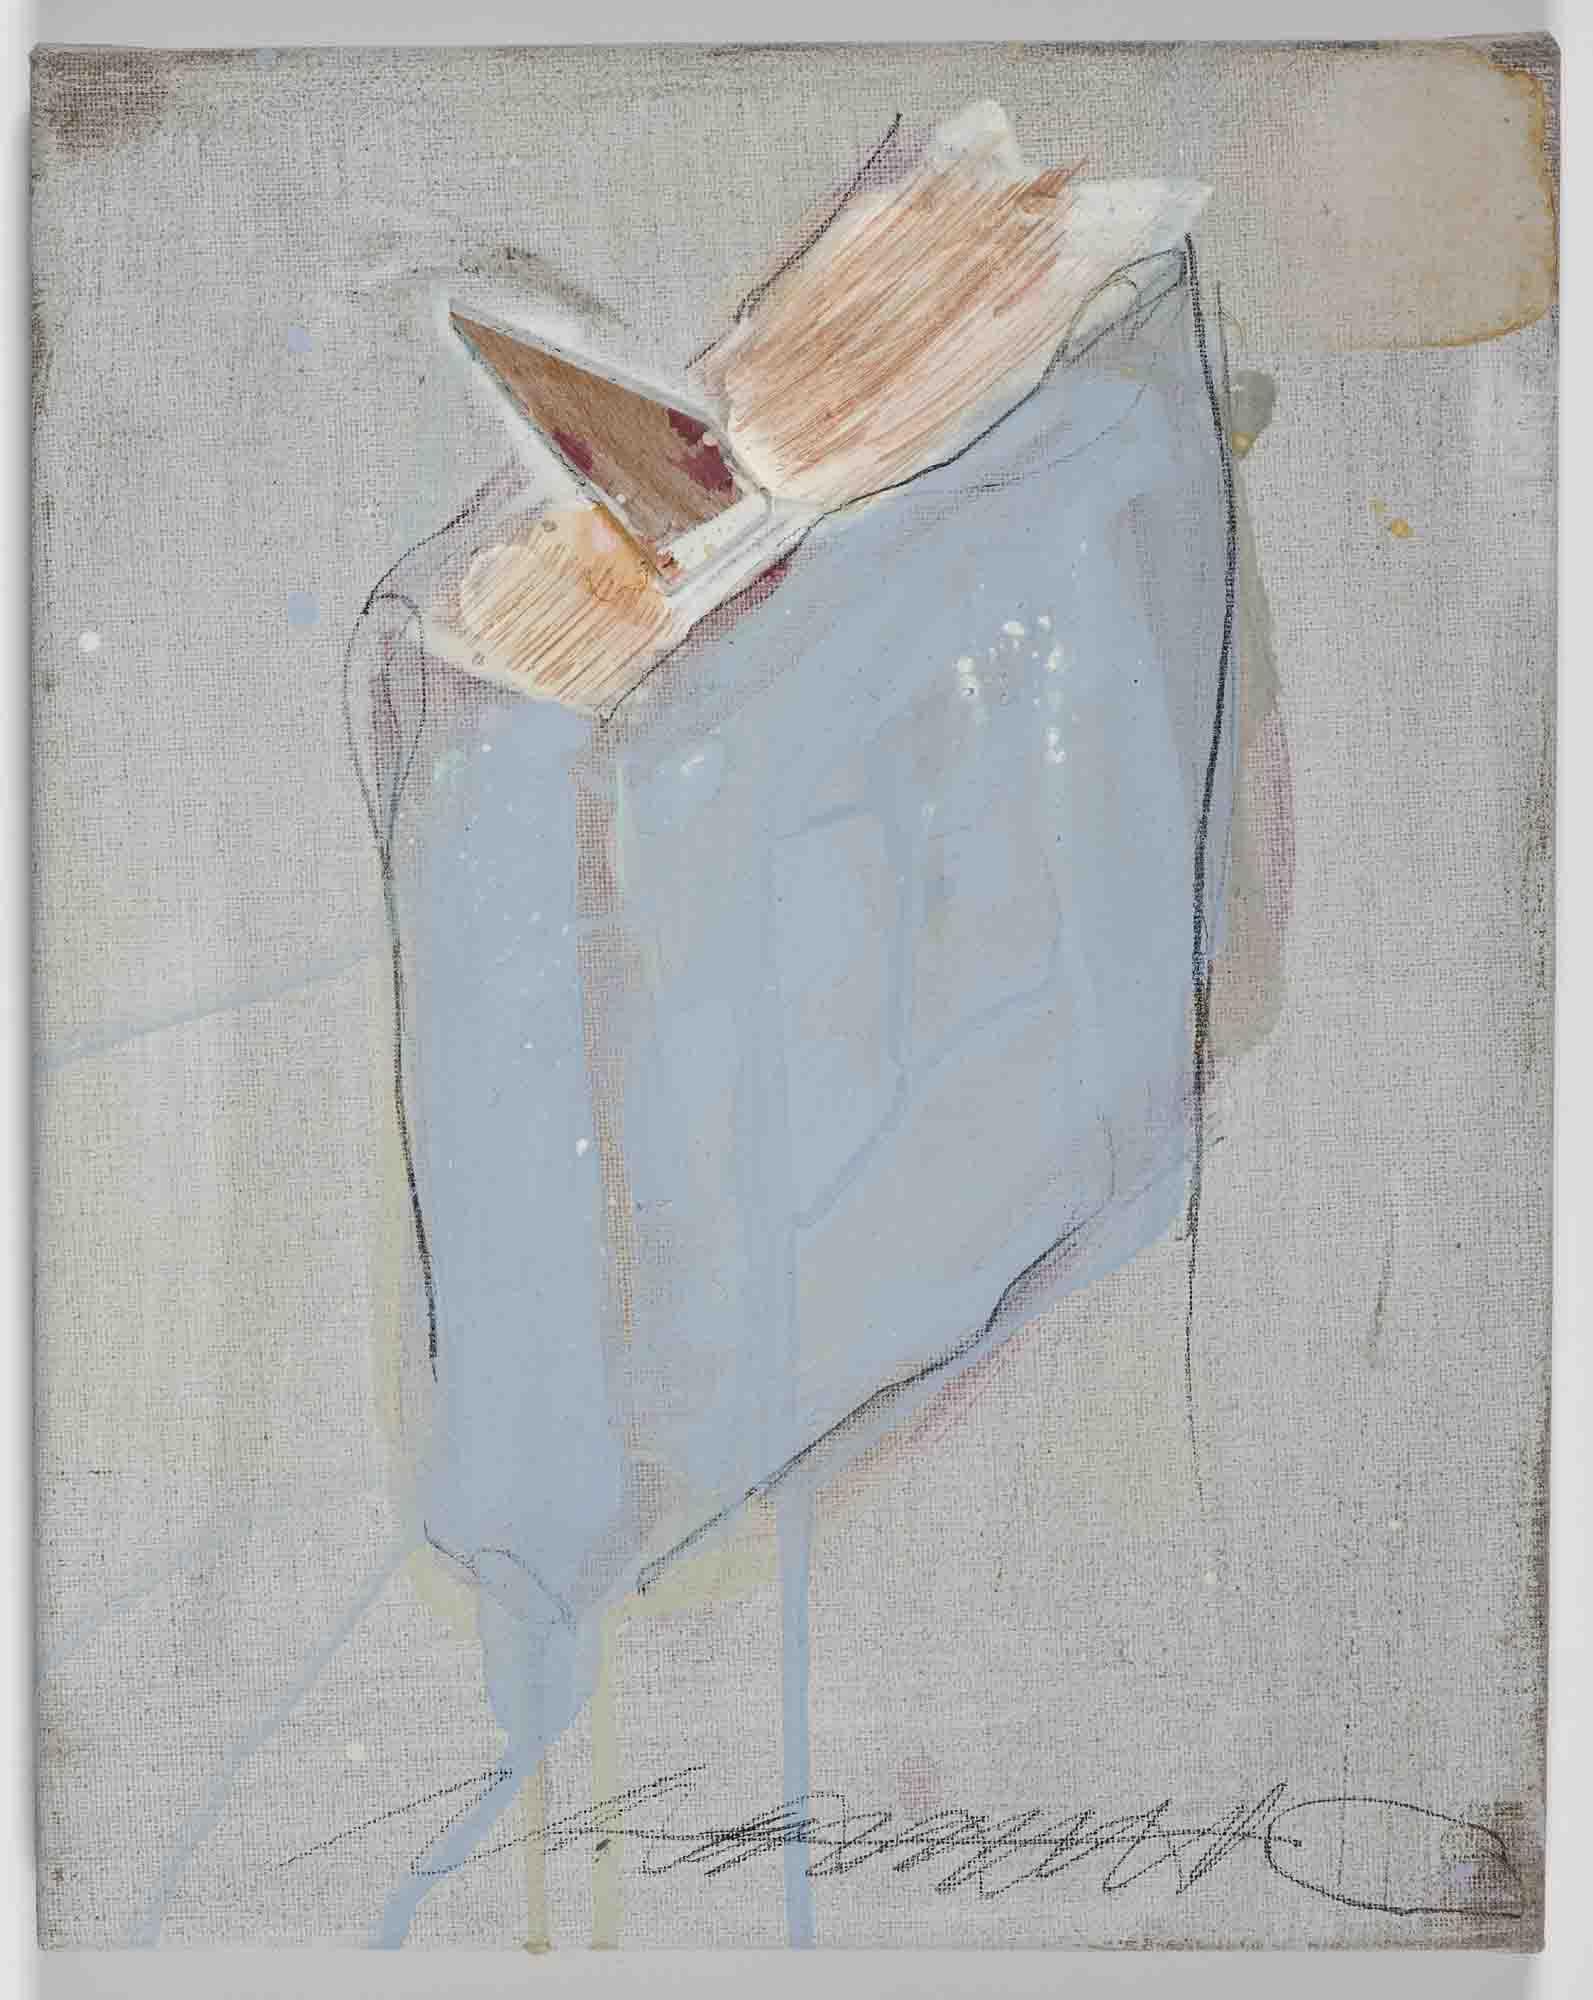 Matthew Bax,  Chapter 7 , 2011, acrylic, pencil, wax, binder, wood on linen, 30 x 30cm